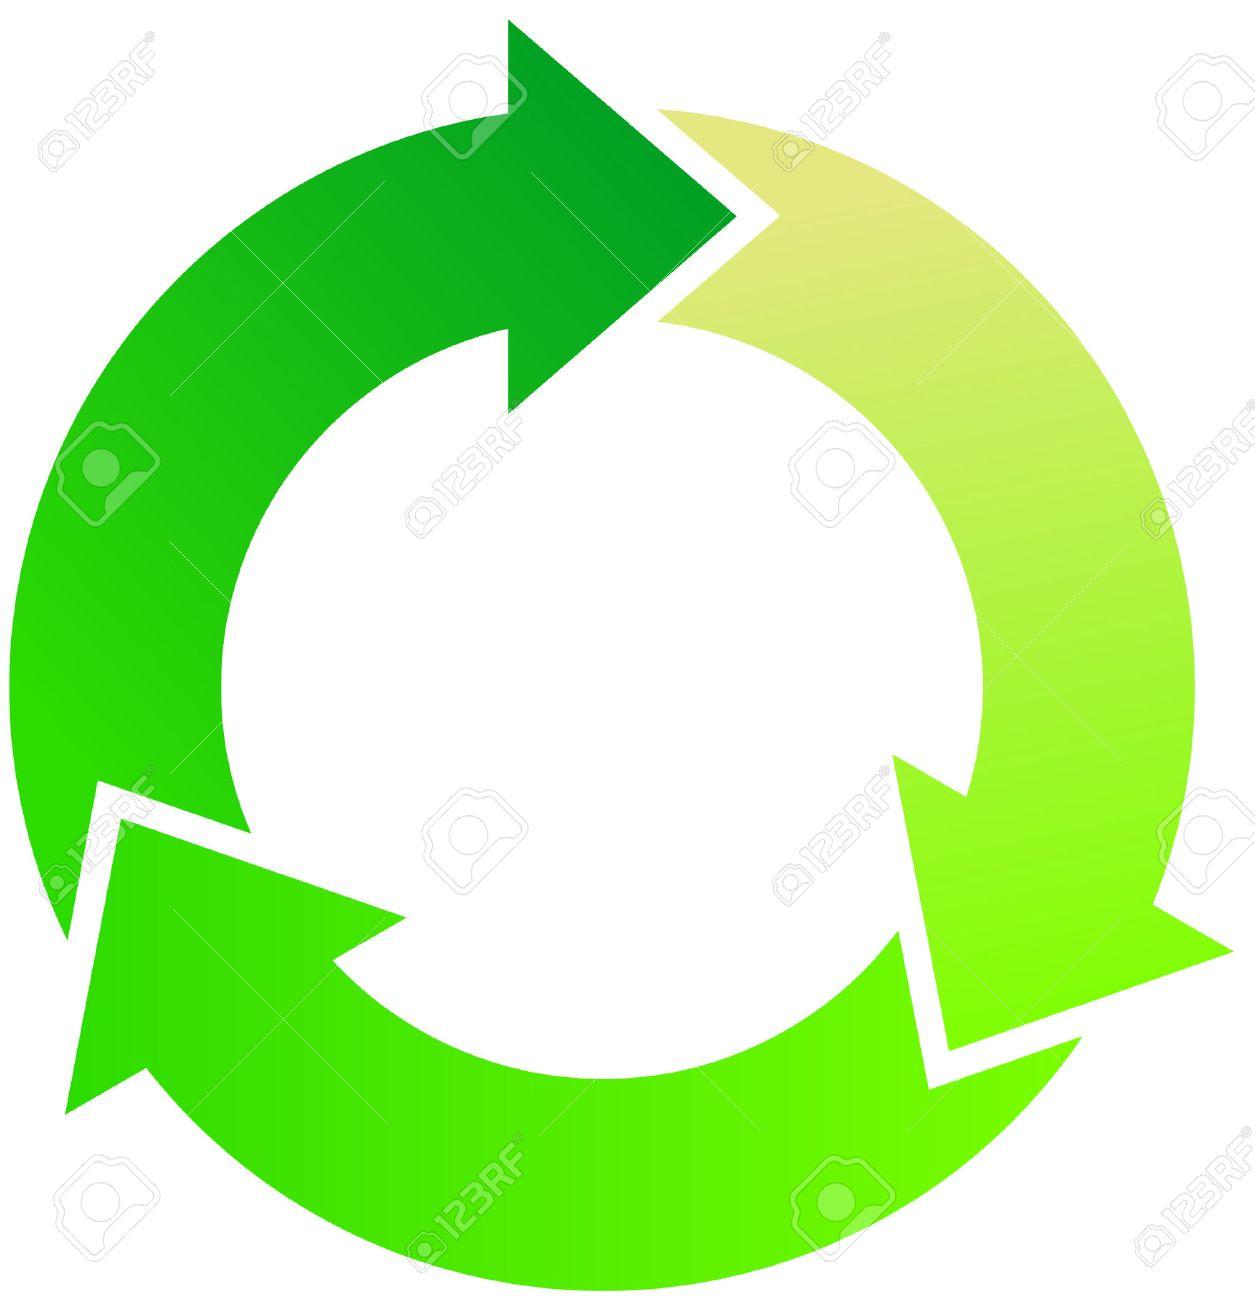 Process cycling arrow by arrow royalty free stock images image - Circular A Colourful Circular Green Arrow Illustration